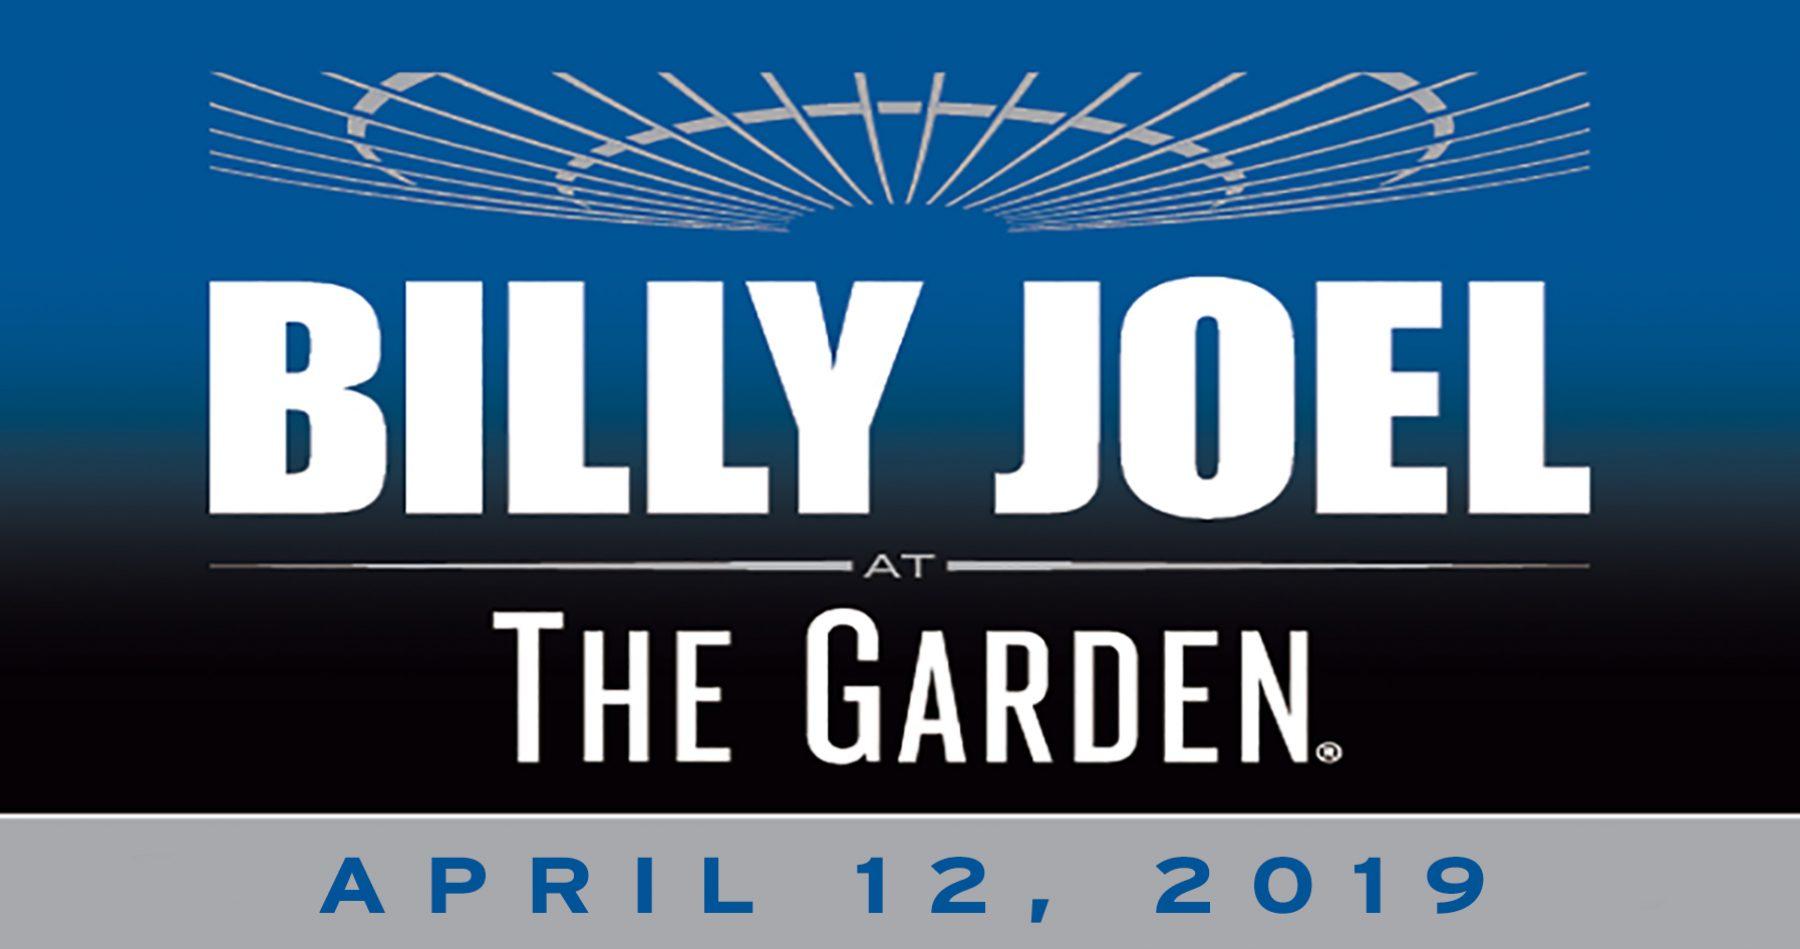 Billy Joel to play Madison Square Garden New York, NY April 12, 2019